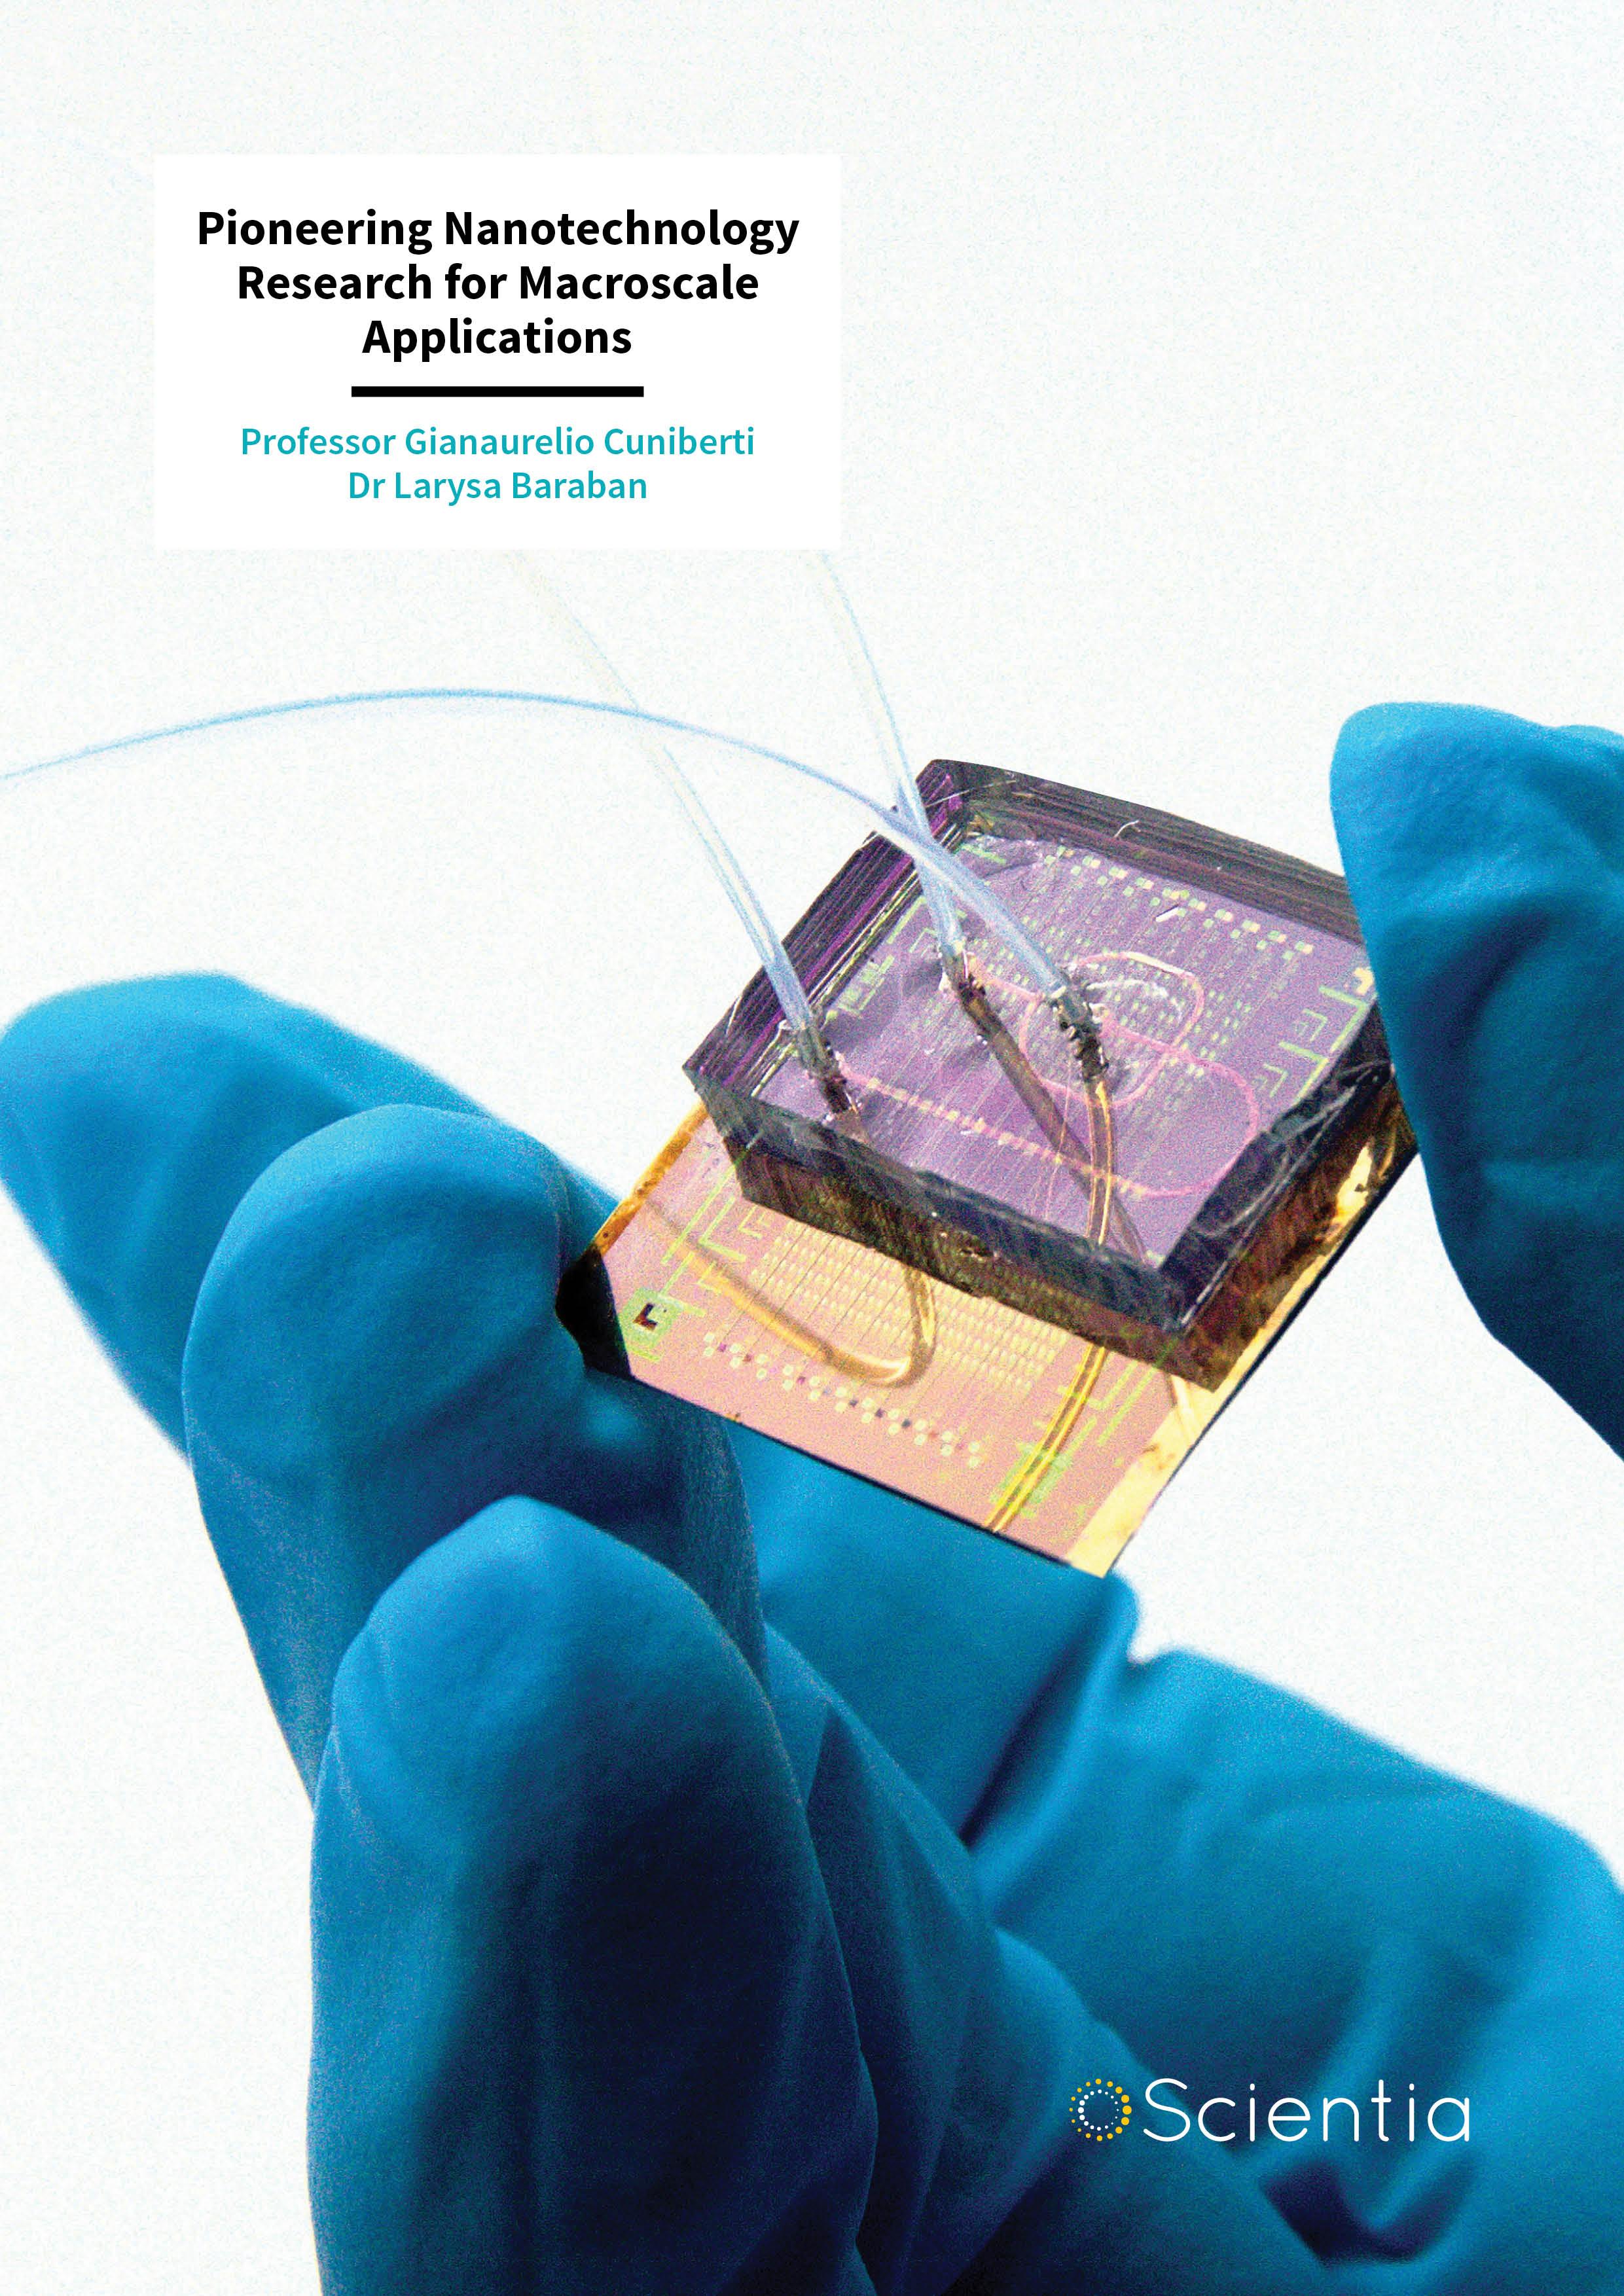 Dr Larysa Baraban – Professor Gianaurelio Cuniberti – Pioneering Nanotechnology Research for Macroscale Applications